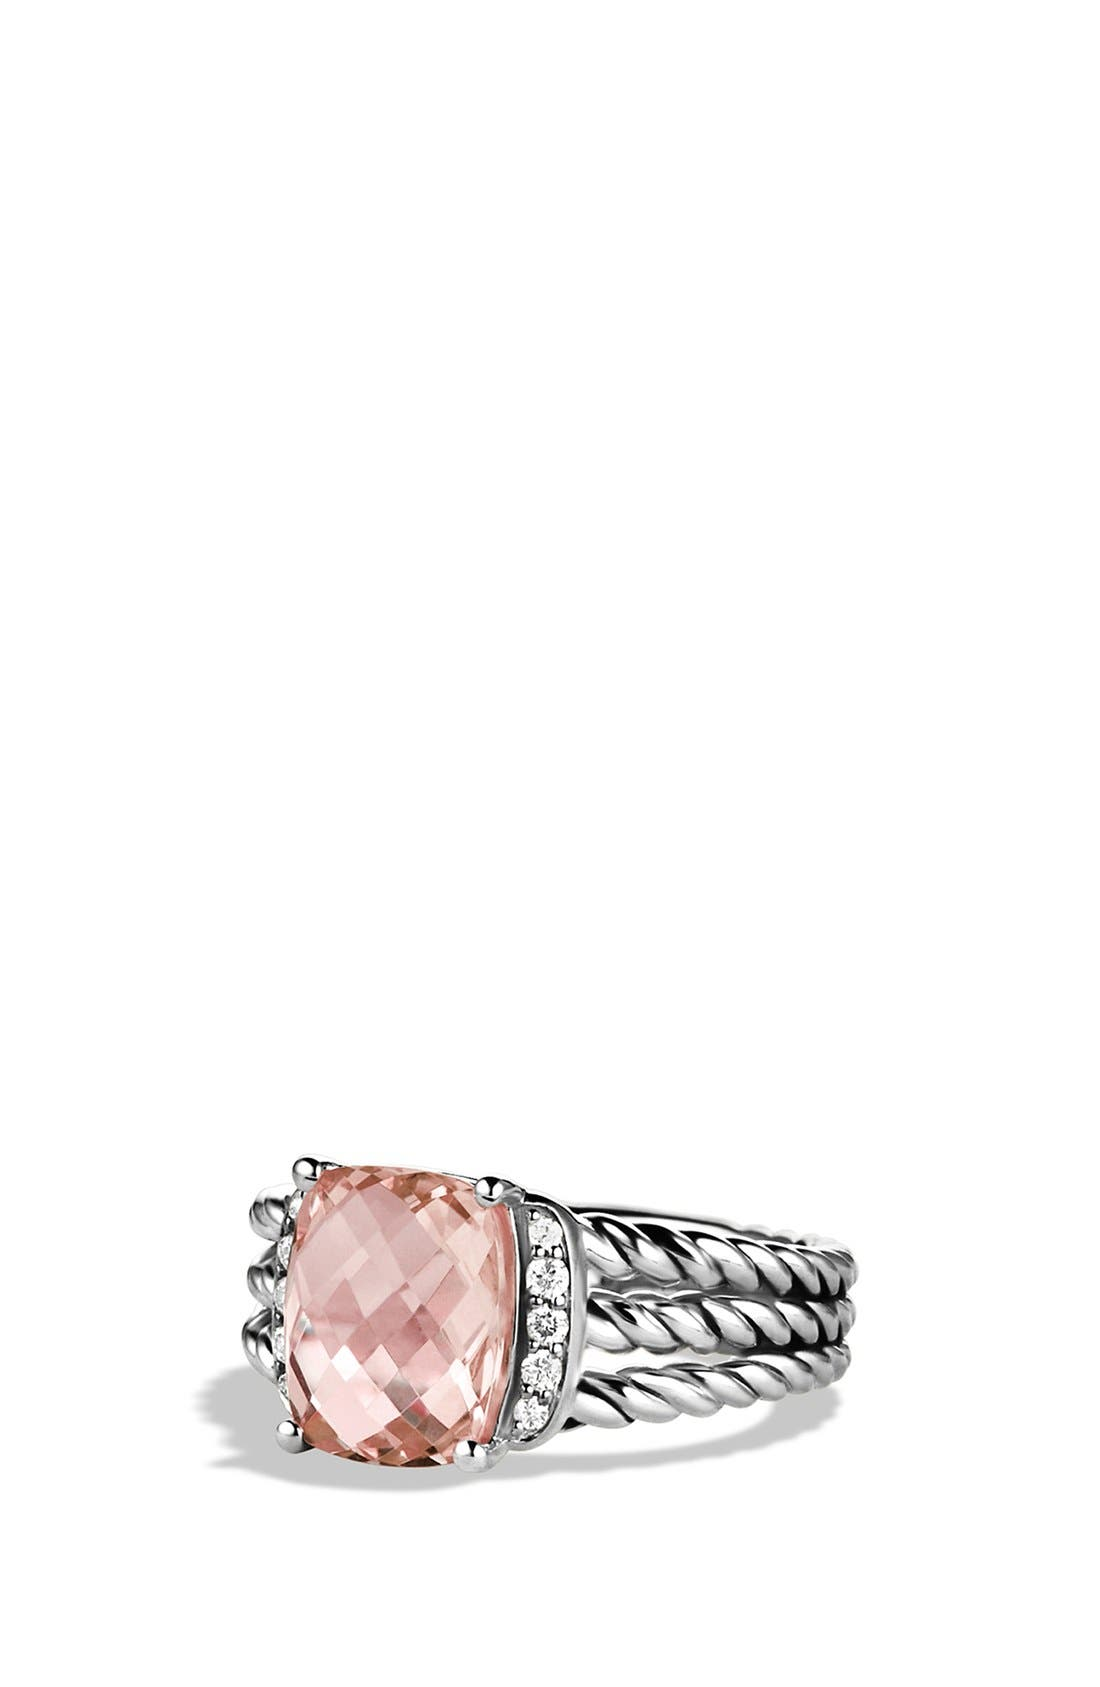 'Wheaton' Petite Ring with Semiprecious Stone & Diamonds,                         Main,                         color, Morganite